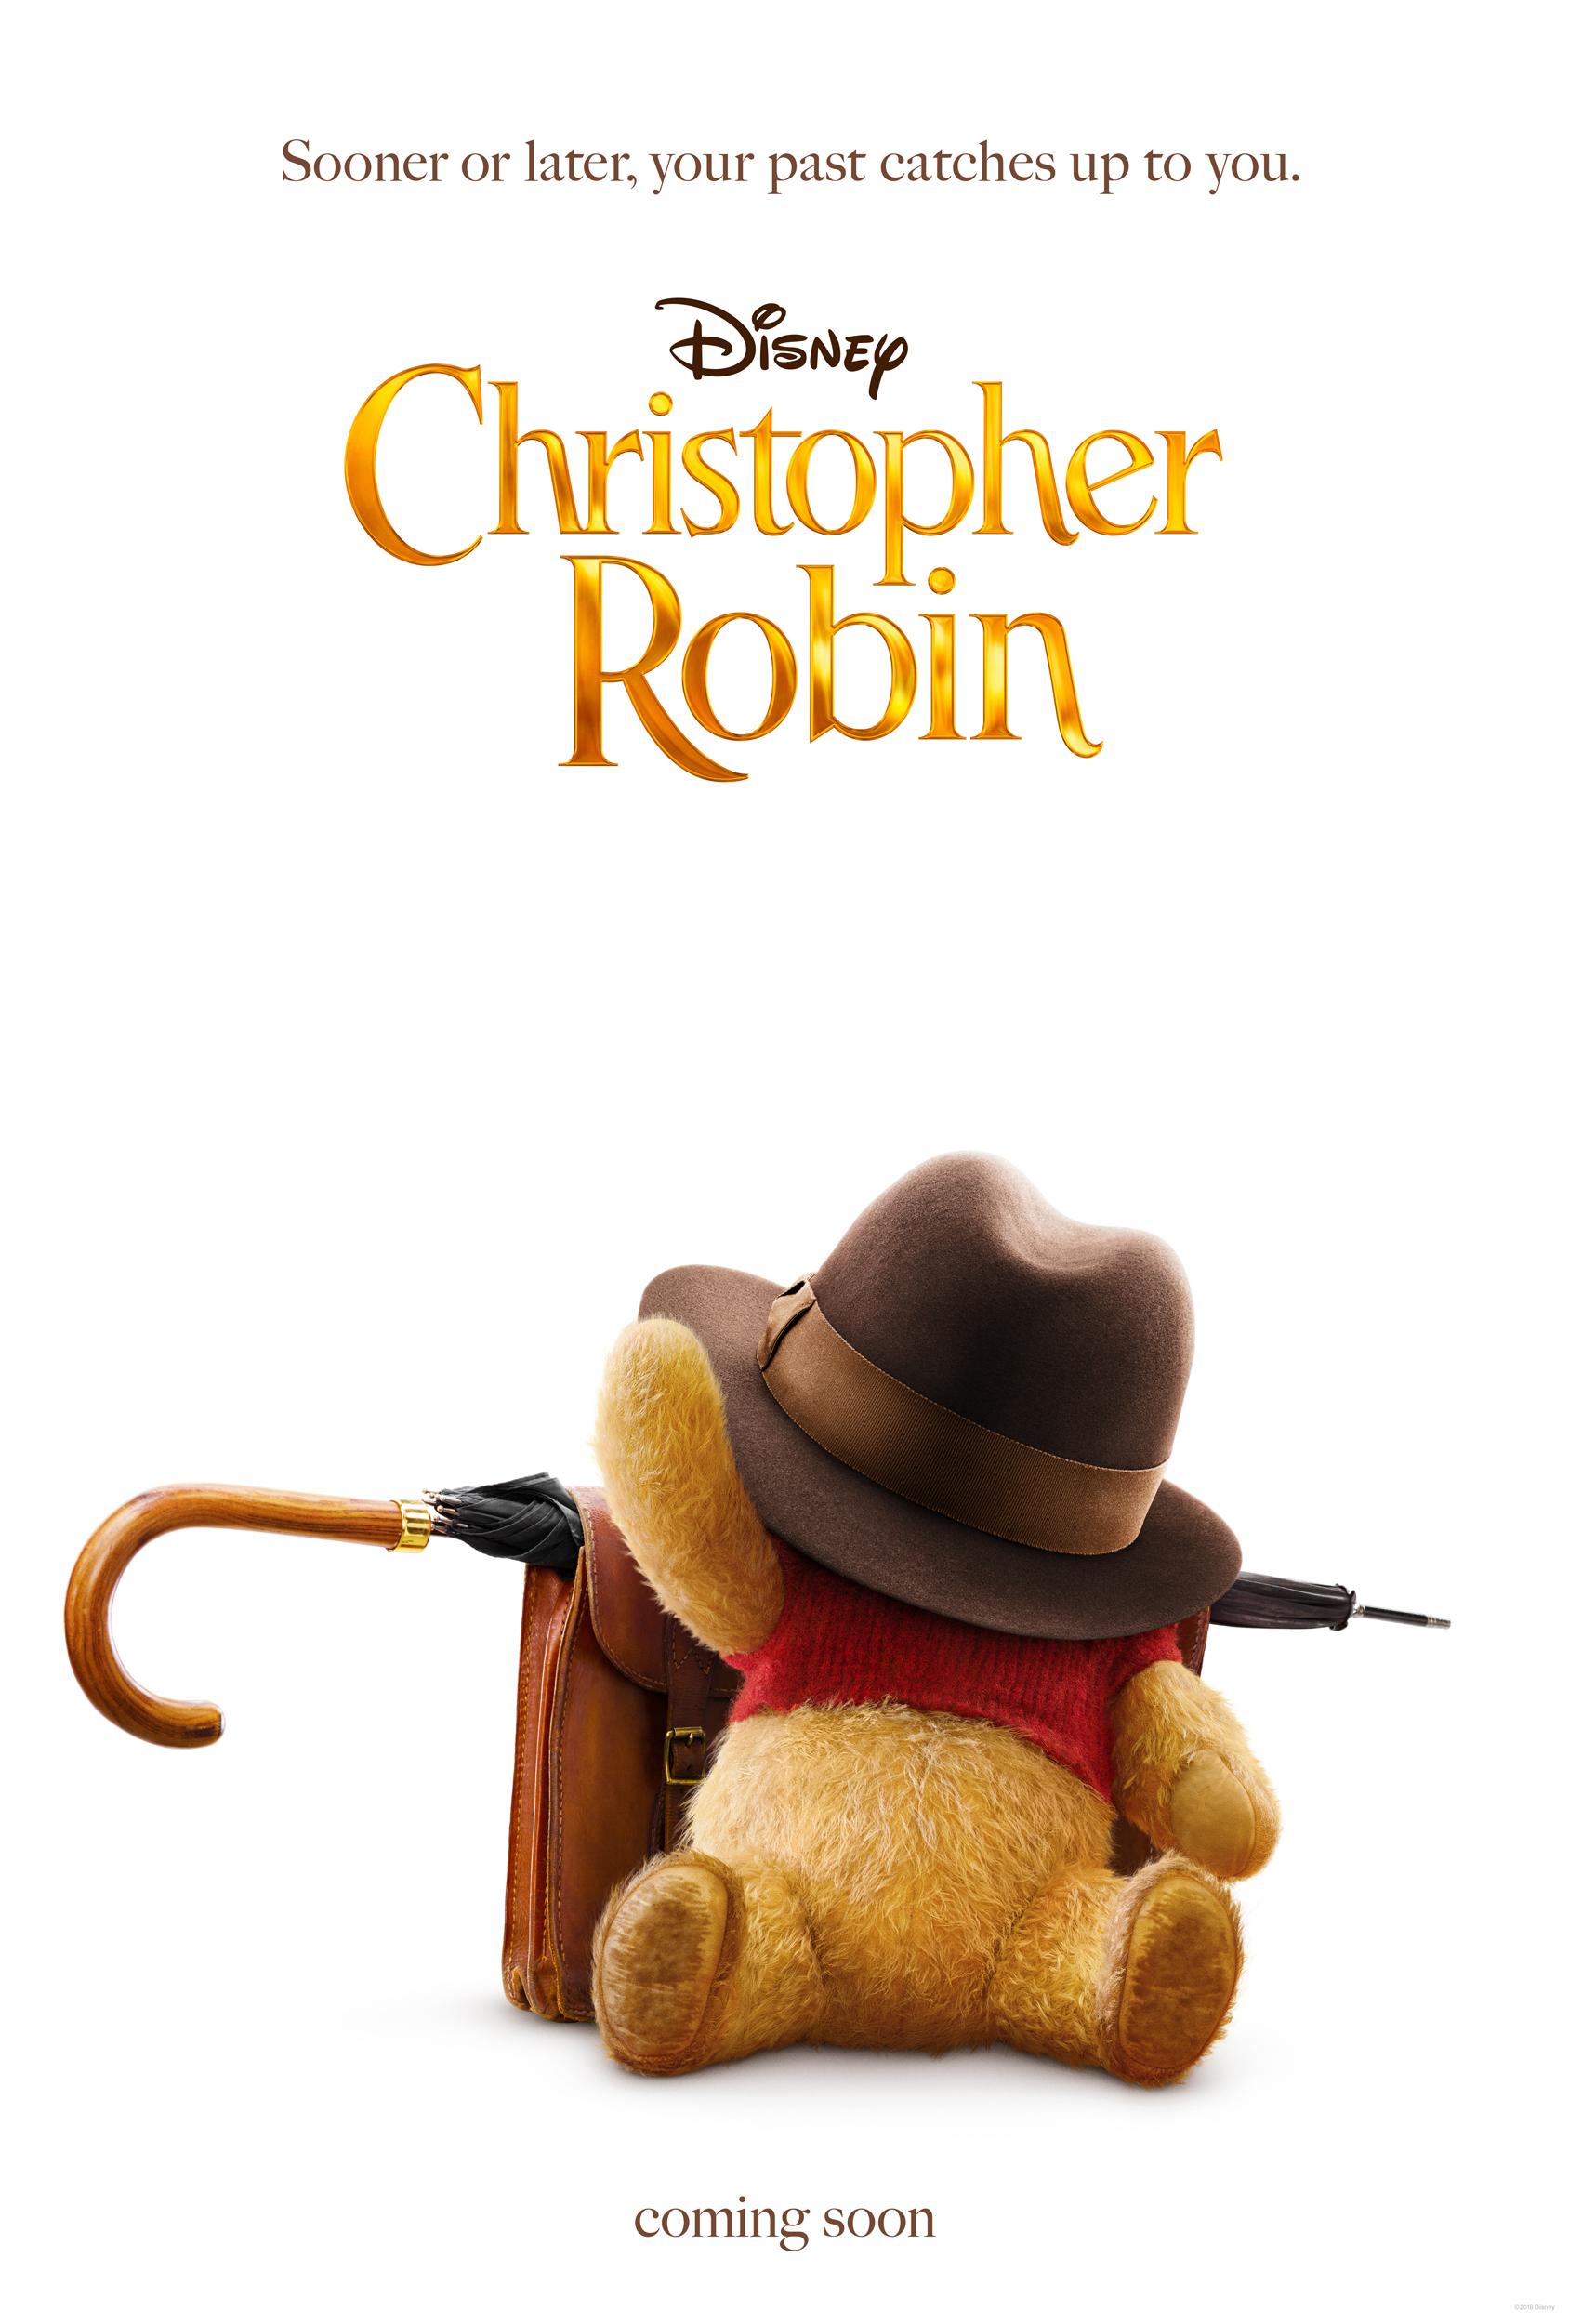 Disney #ChristopherRobin